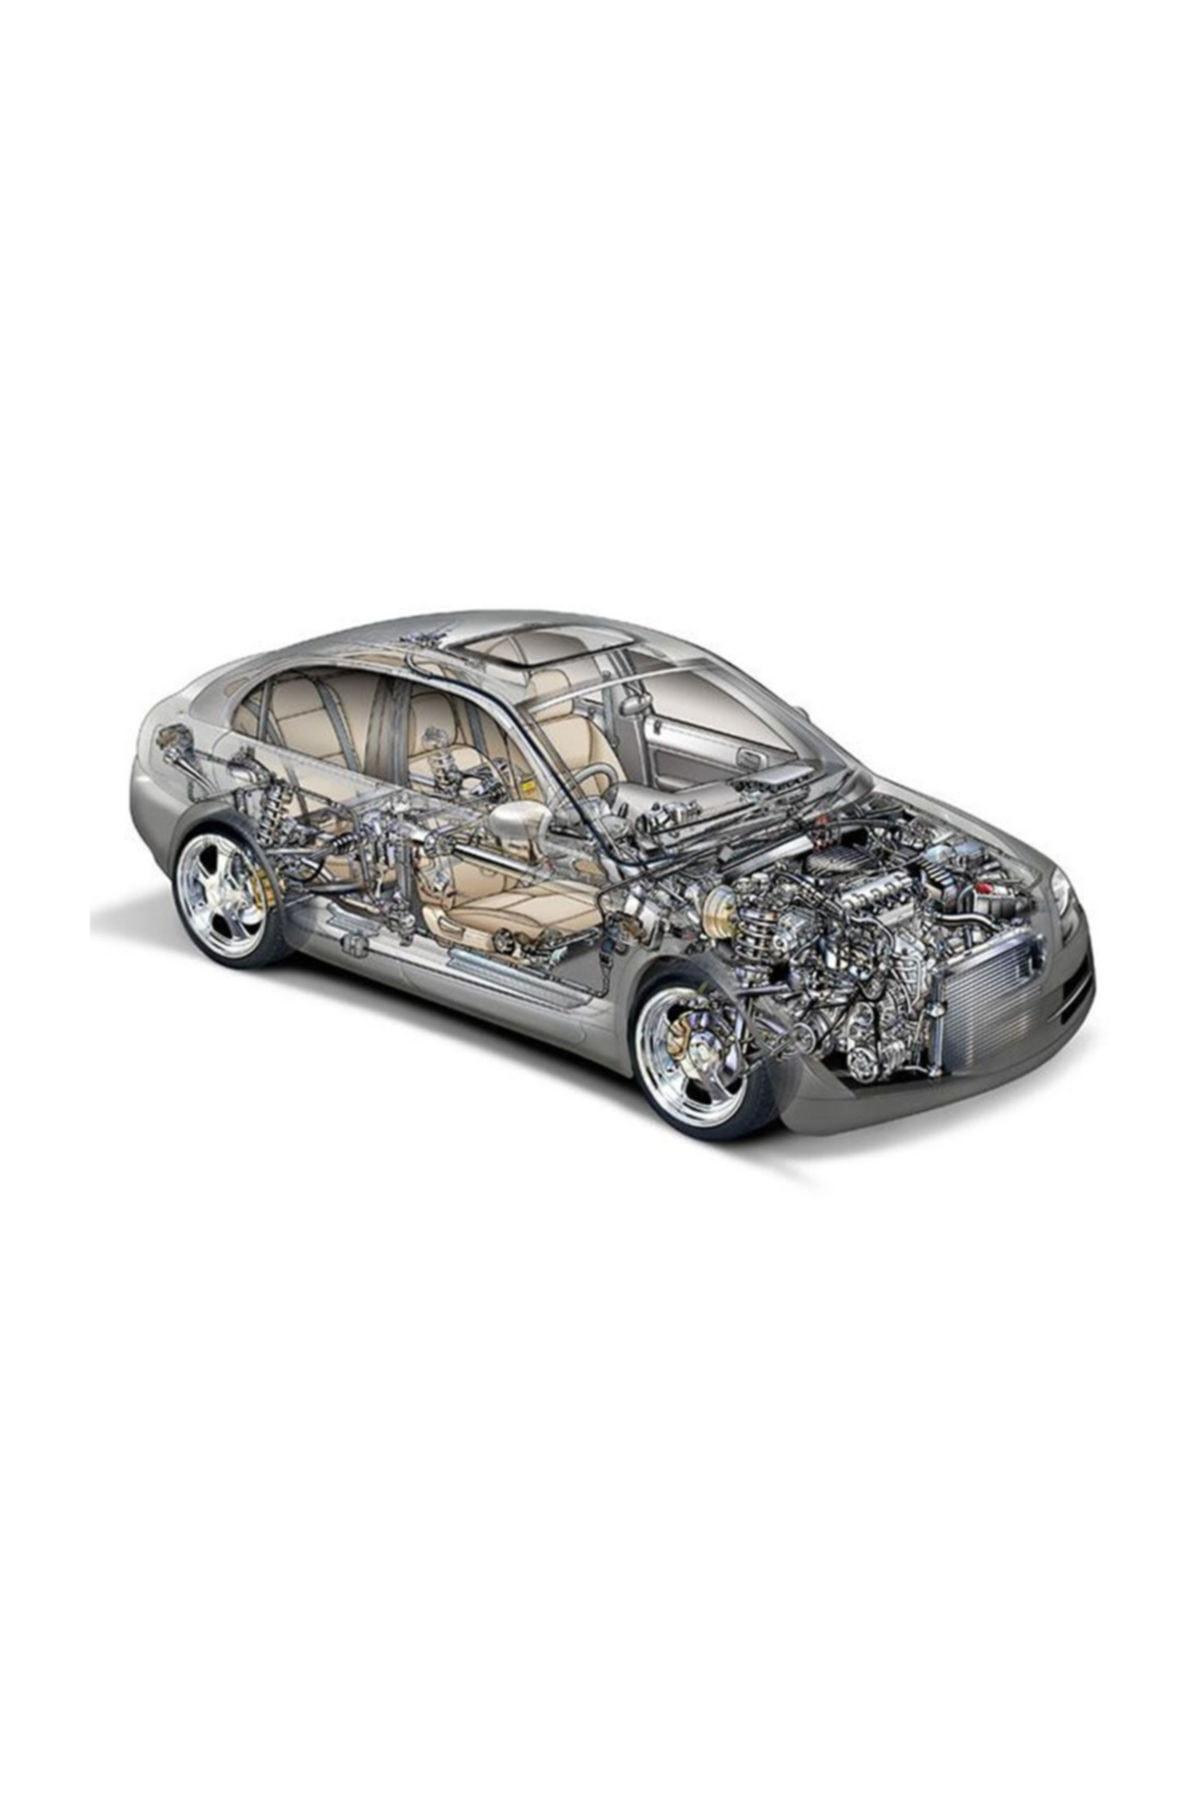 YENMAK Piston+Segman 050-(96.50)-(Nissan: D22 9802 Td27 ) - Yen-4569-050 1